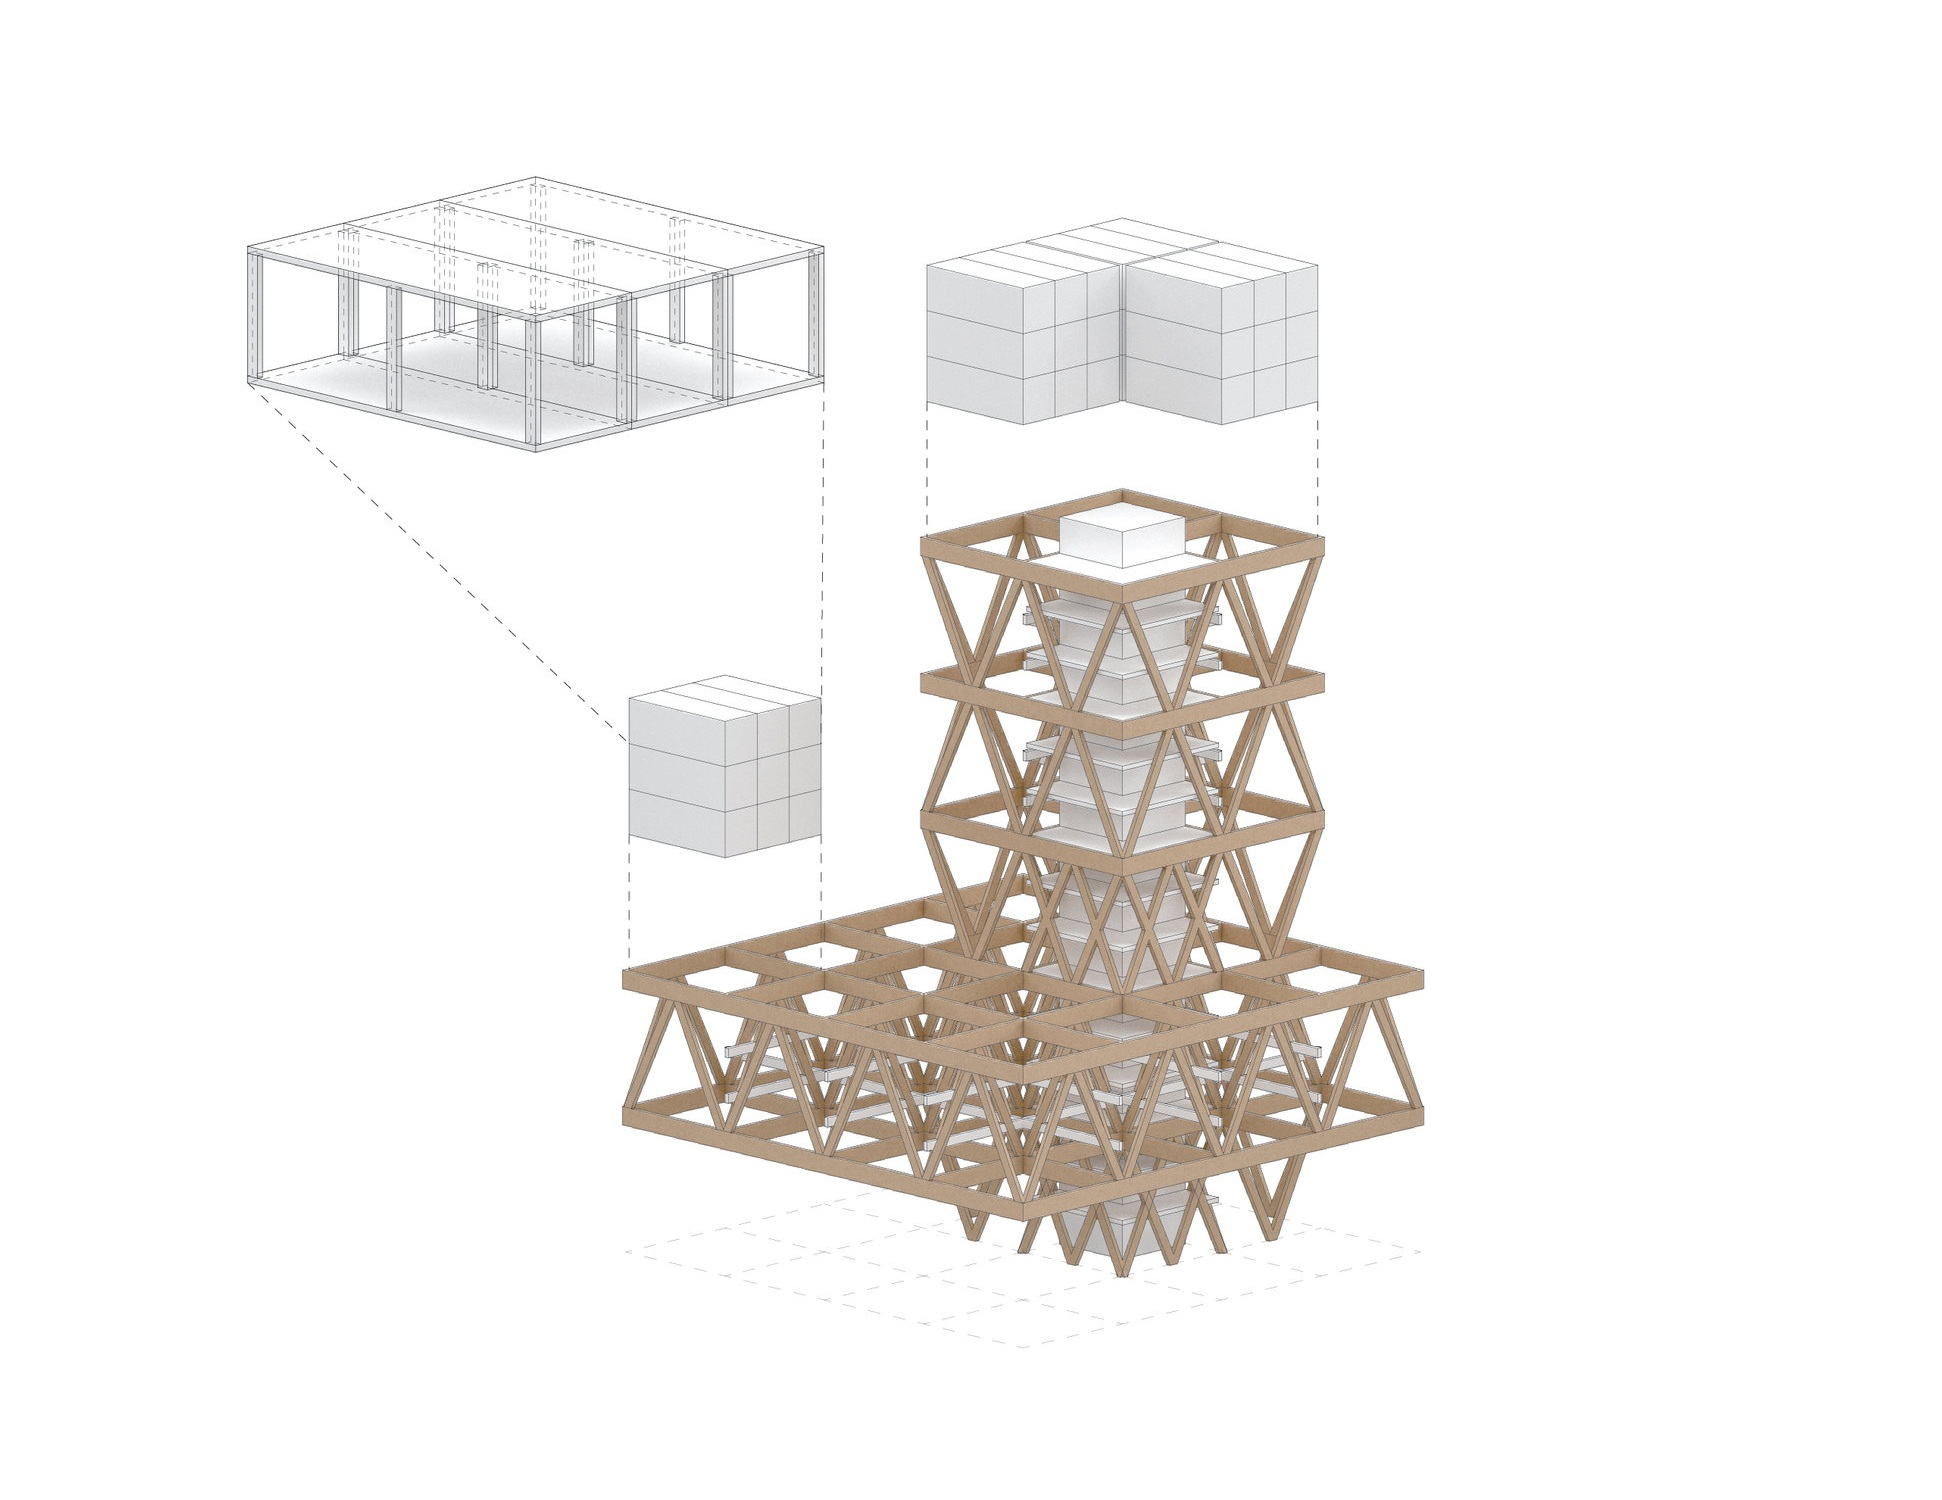 diagram2-02.jpg